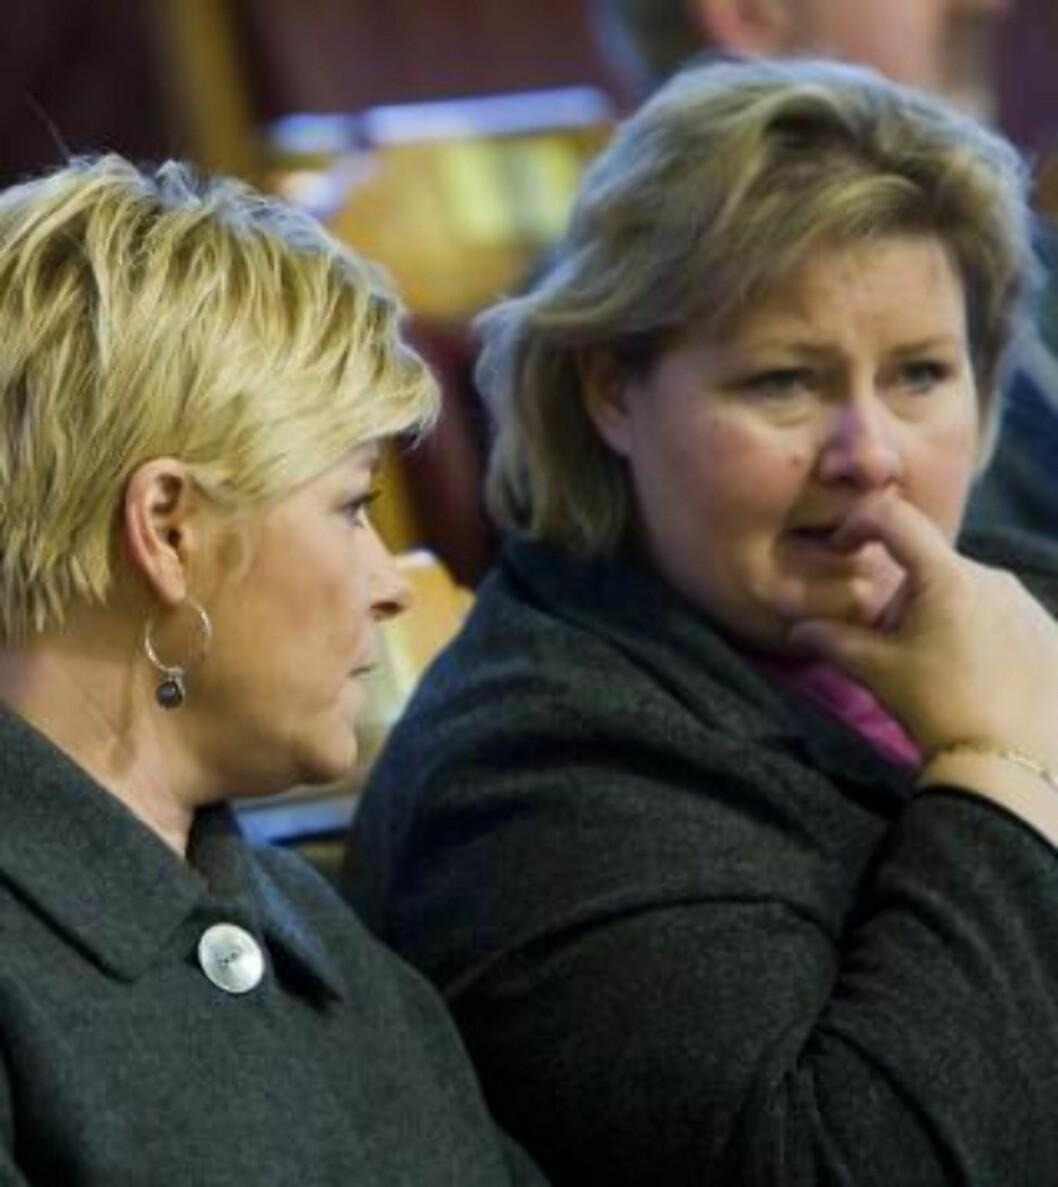 <strong>VIL I REGJERING SAMMEN:</strong> Siv Jensen og Erna Solberg i Stortinget. Foto: Heiko Junge / SCANPIX